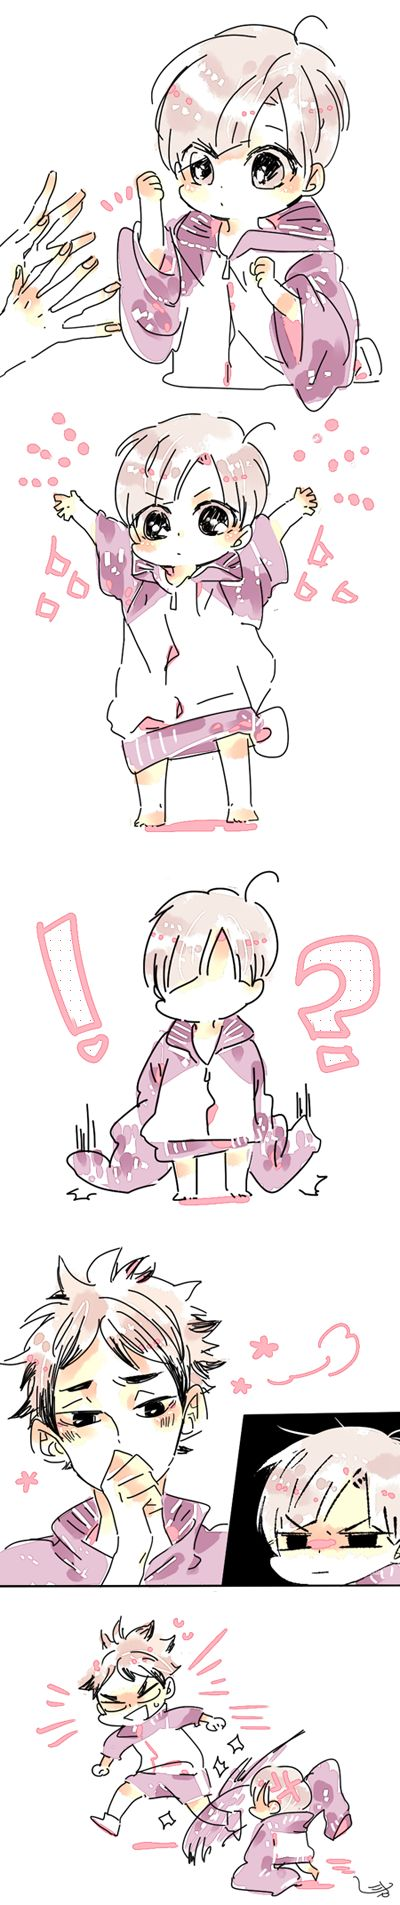 「瀬見白瀬見.0605」/「JuJu」の漫画 [pixiv]